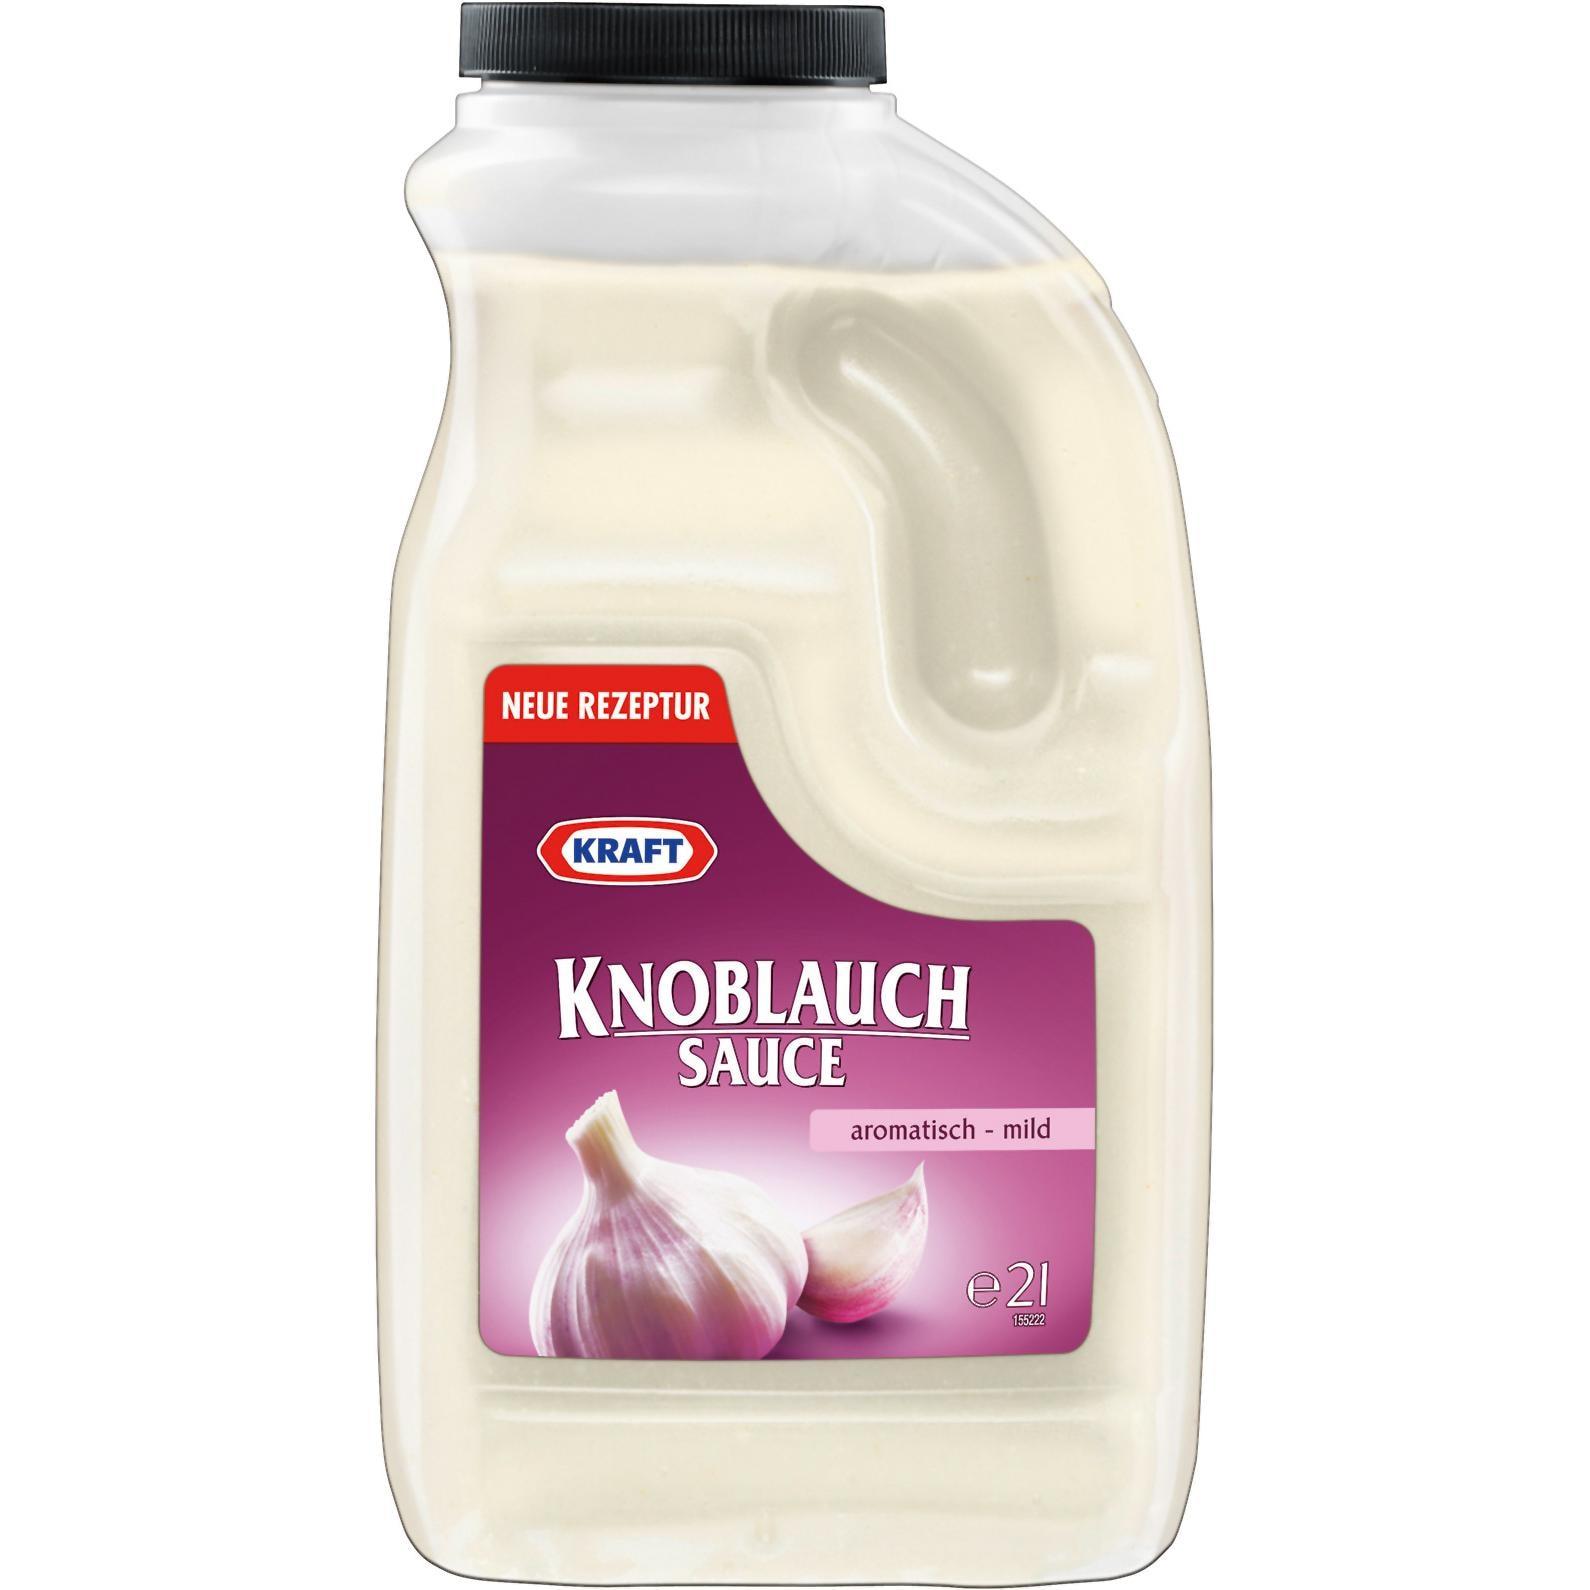 Kraft - Knoblauch Sauce - 2l